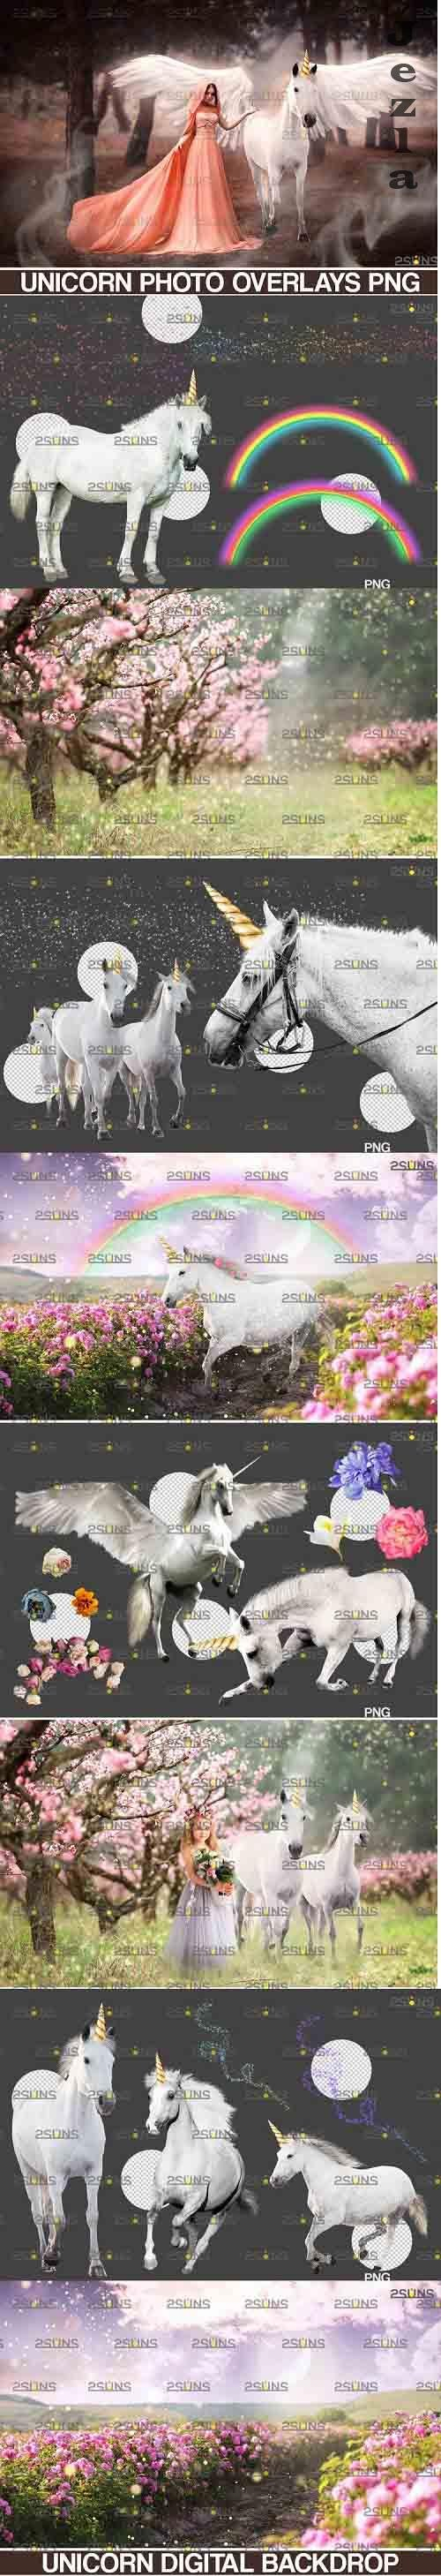 Unicorn overlay & Flower backdrop, White Horse png overlays - 738327